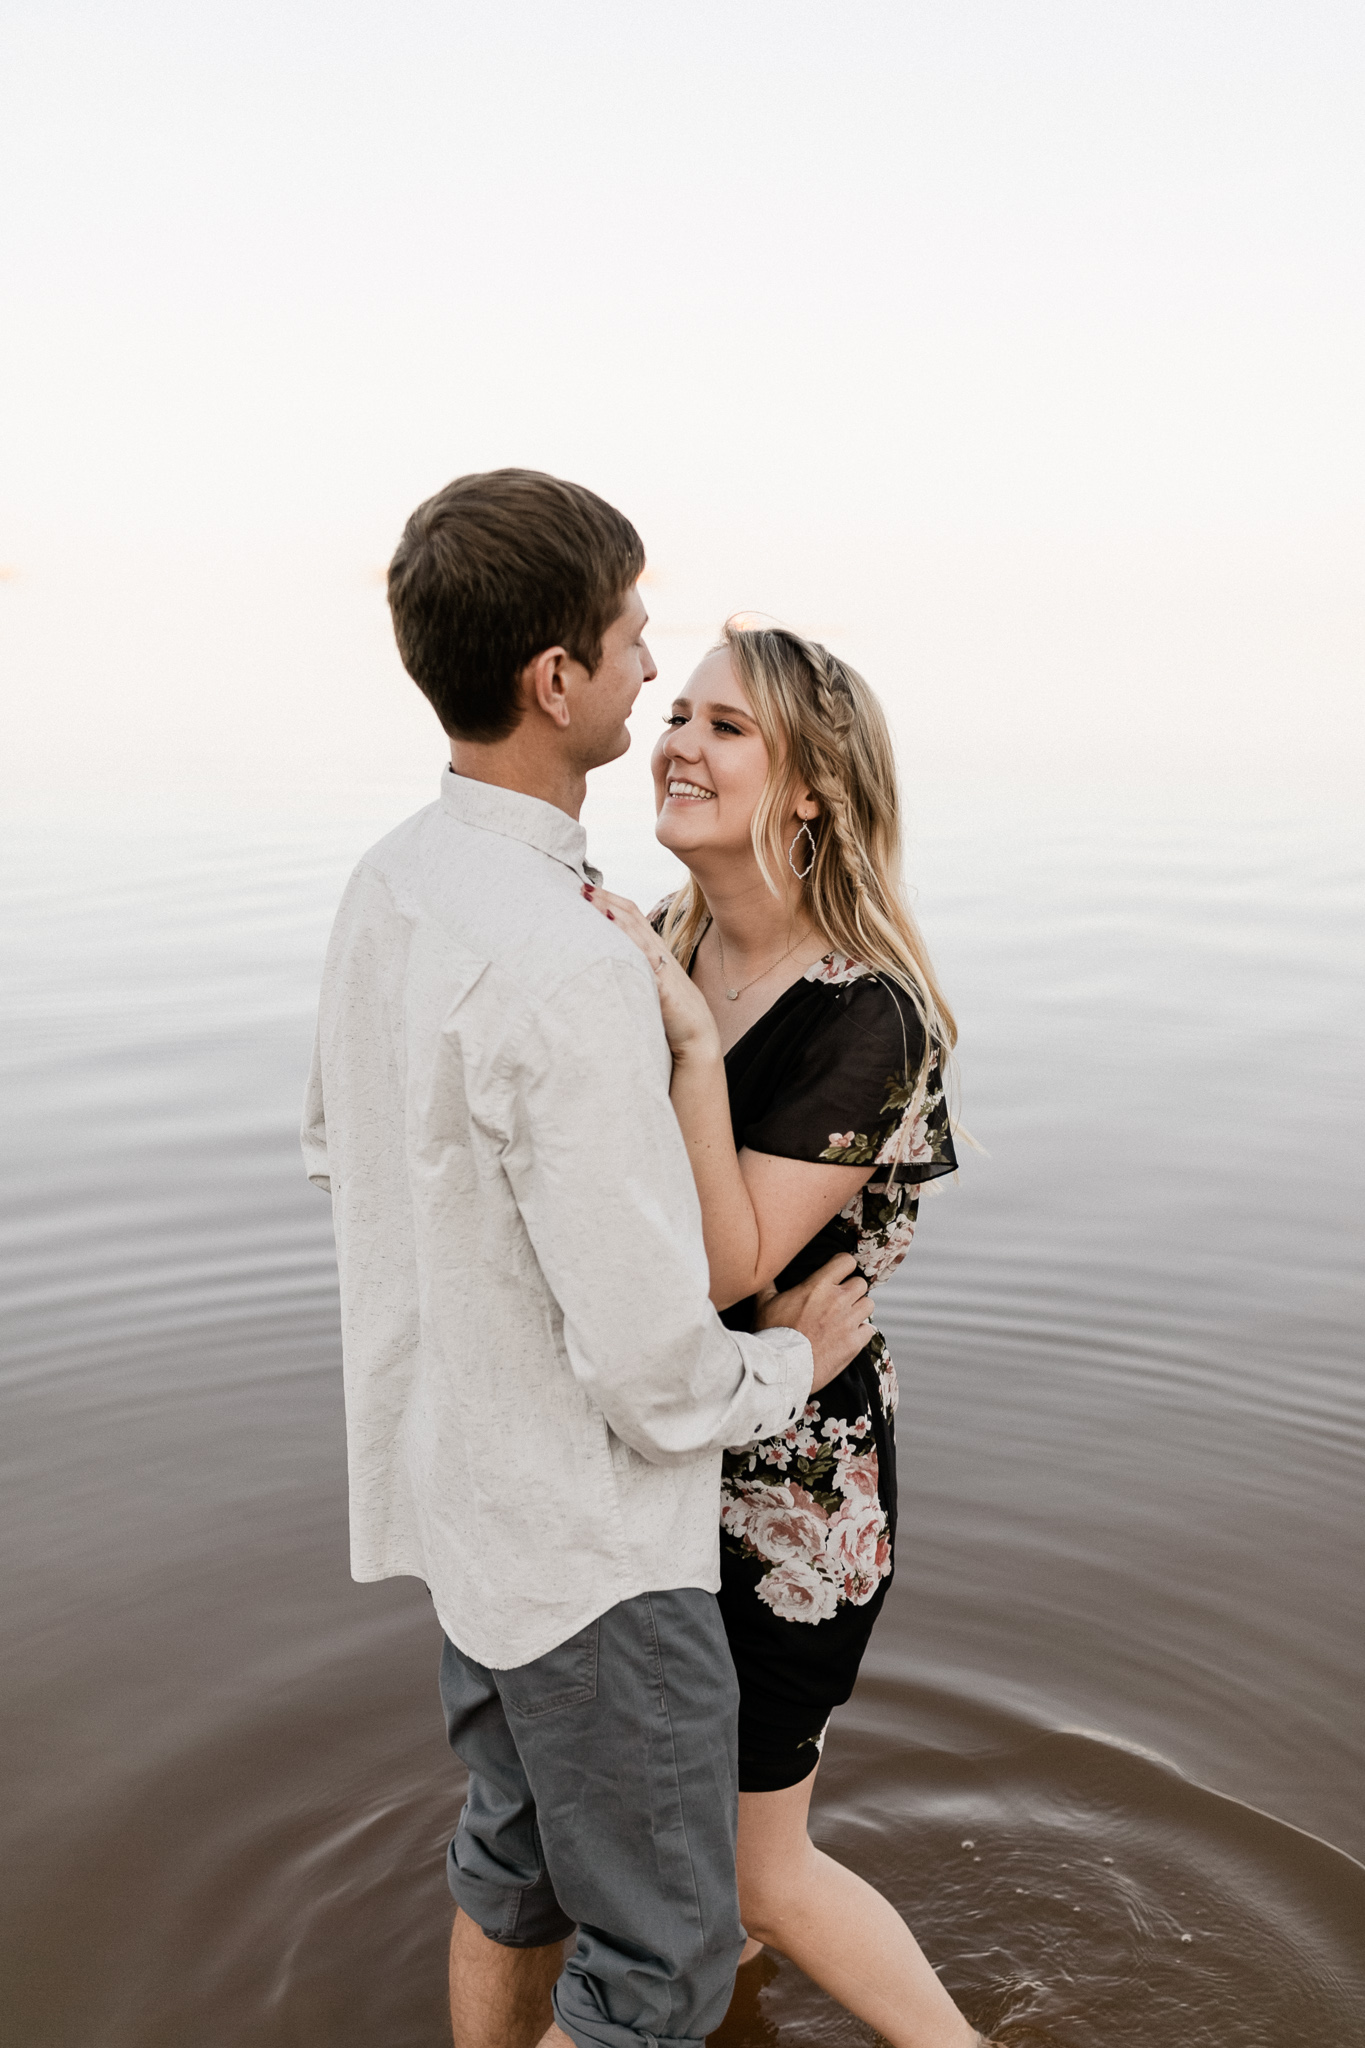 Kyle + Brittany   Fall Lake Engagement Photos   Oklahoma Lifestyle Photographer-24.jpg